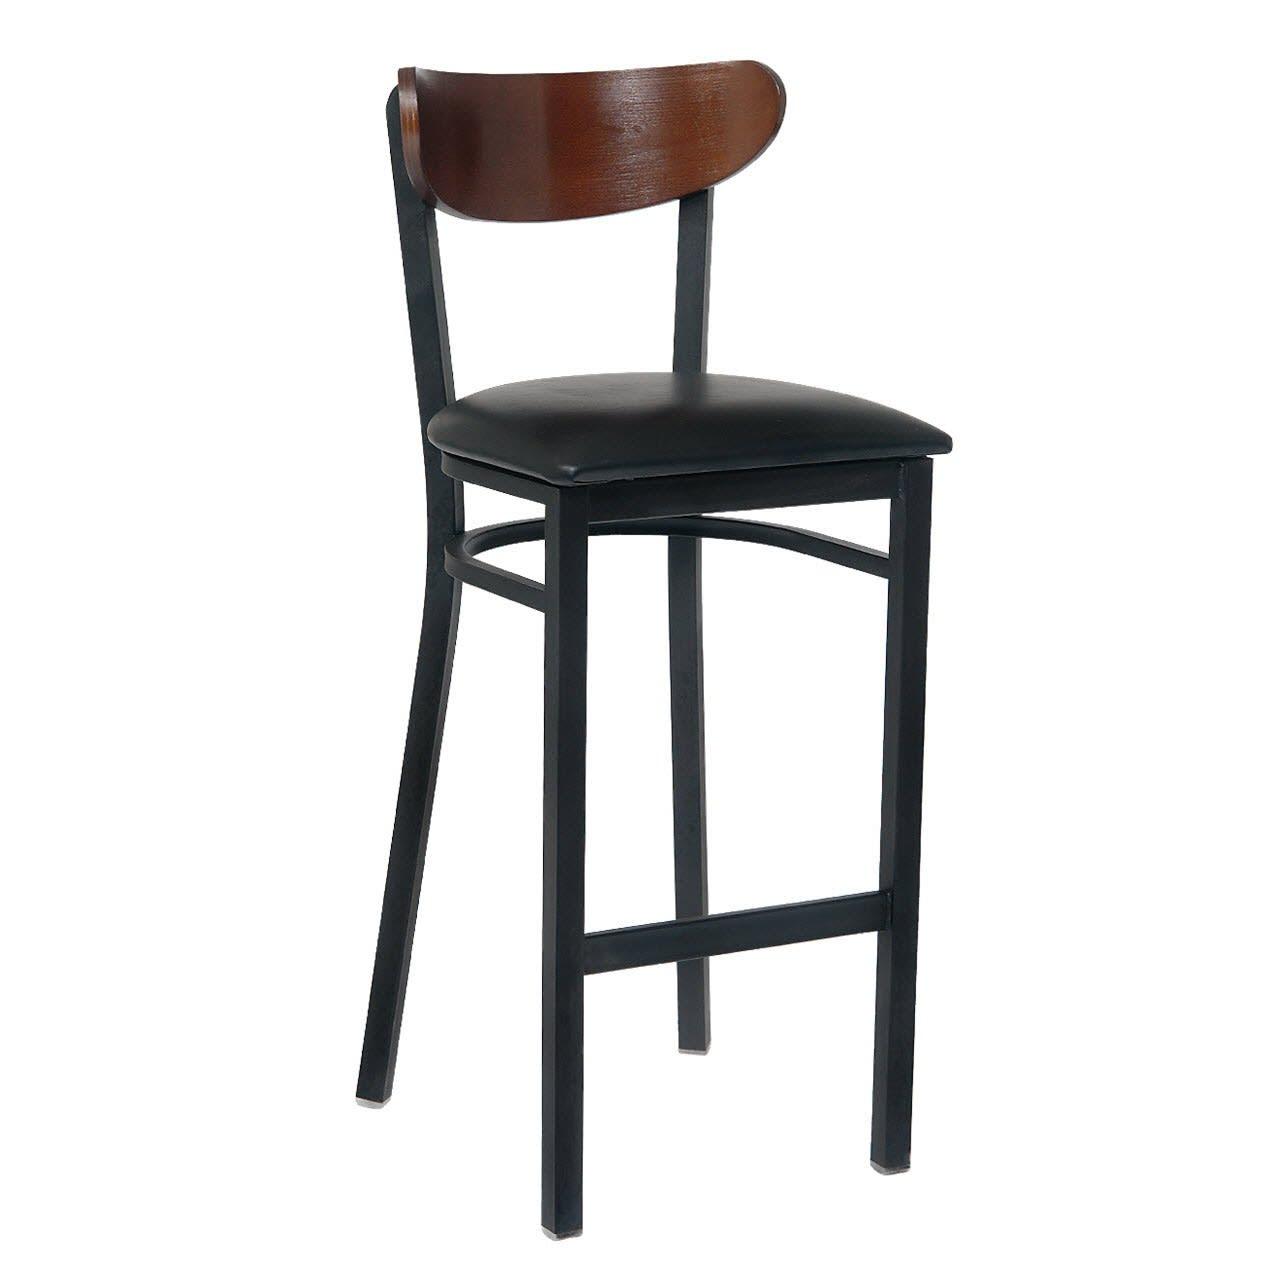 Miraculous Modern Curved Back Metal Bar Stool Uwap Interior Chair Design Uwaporg